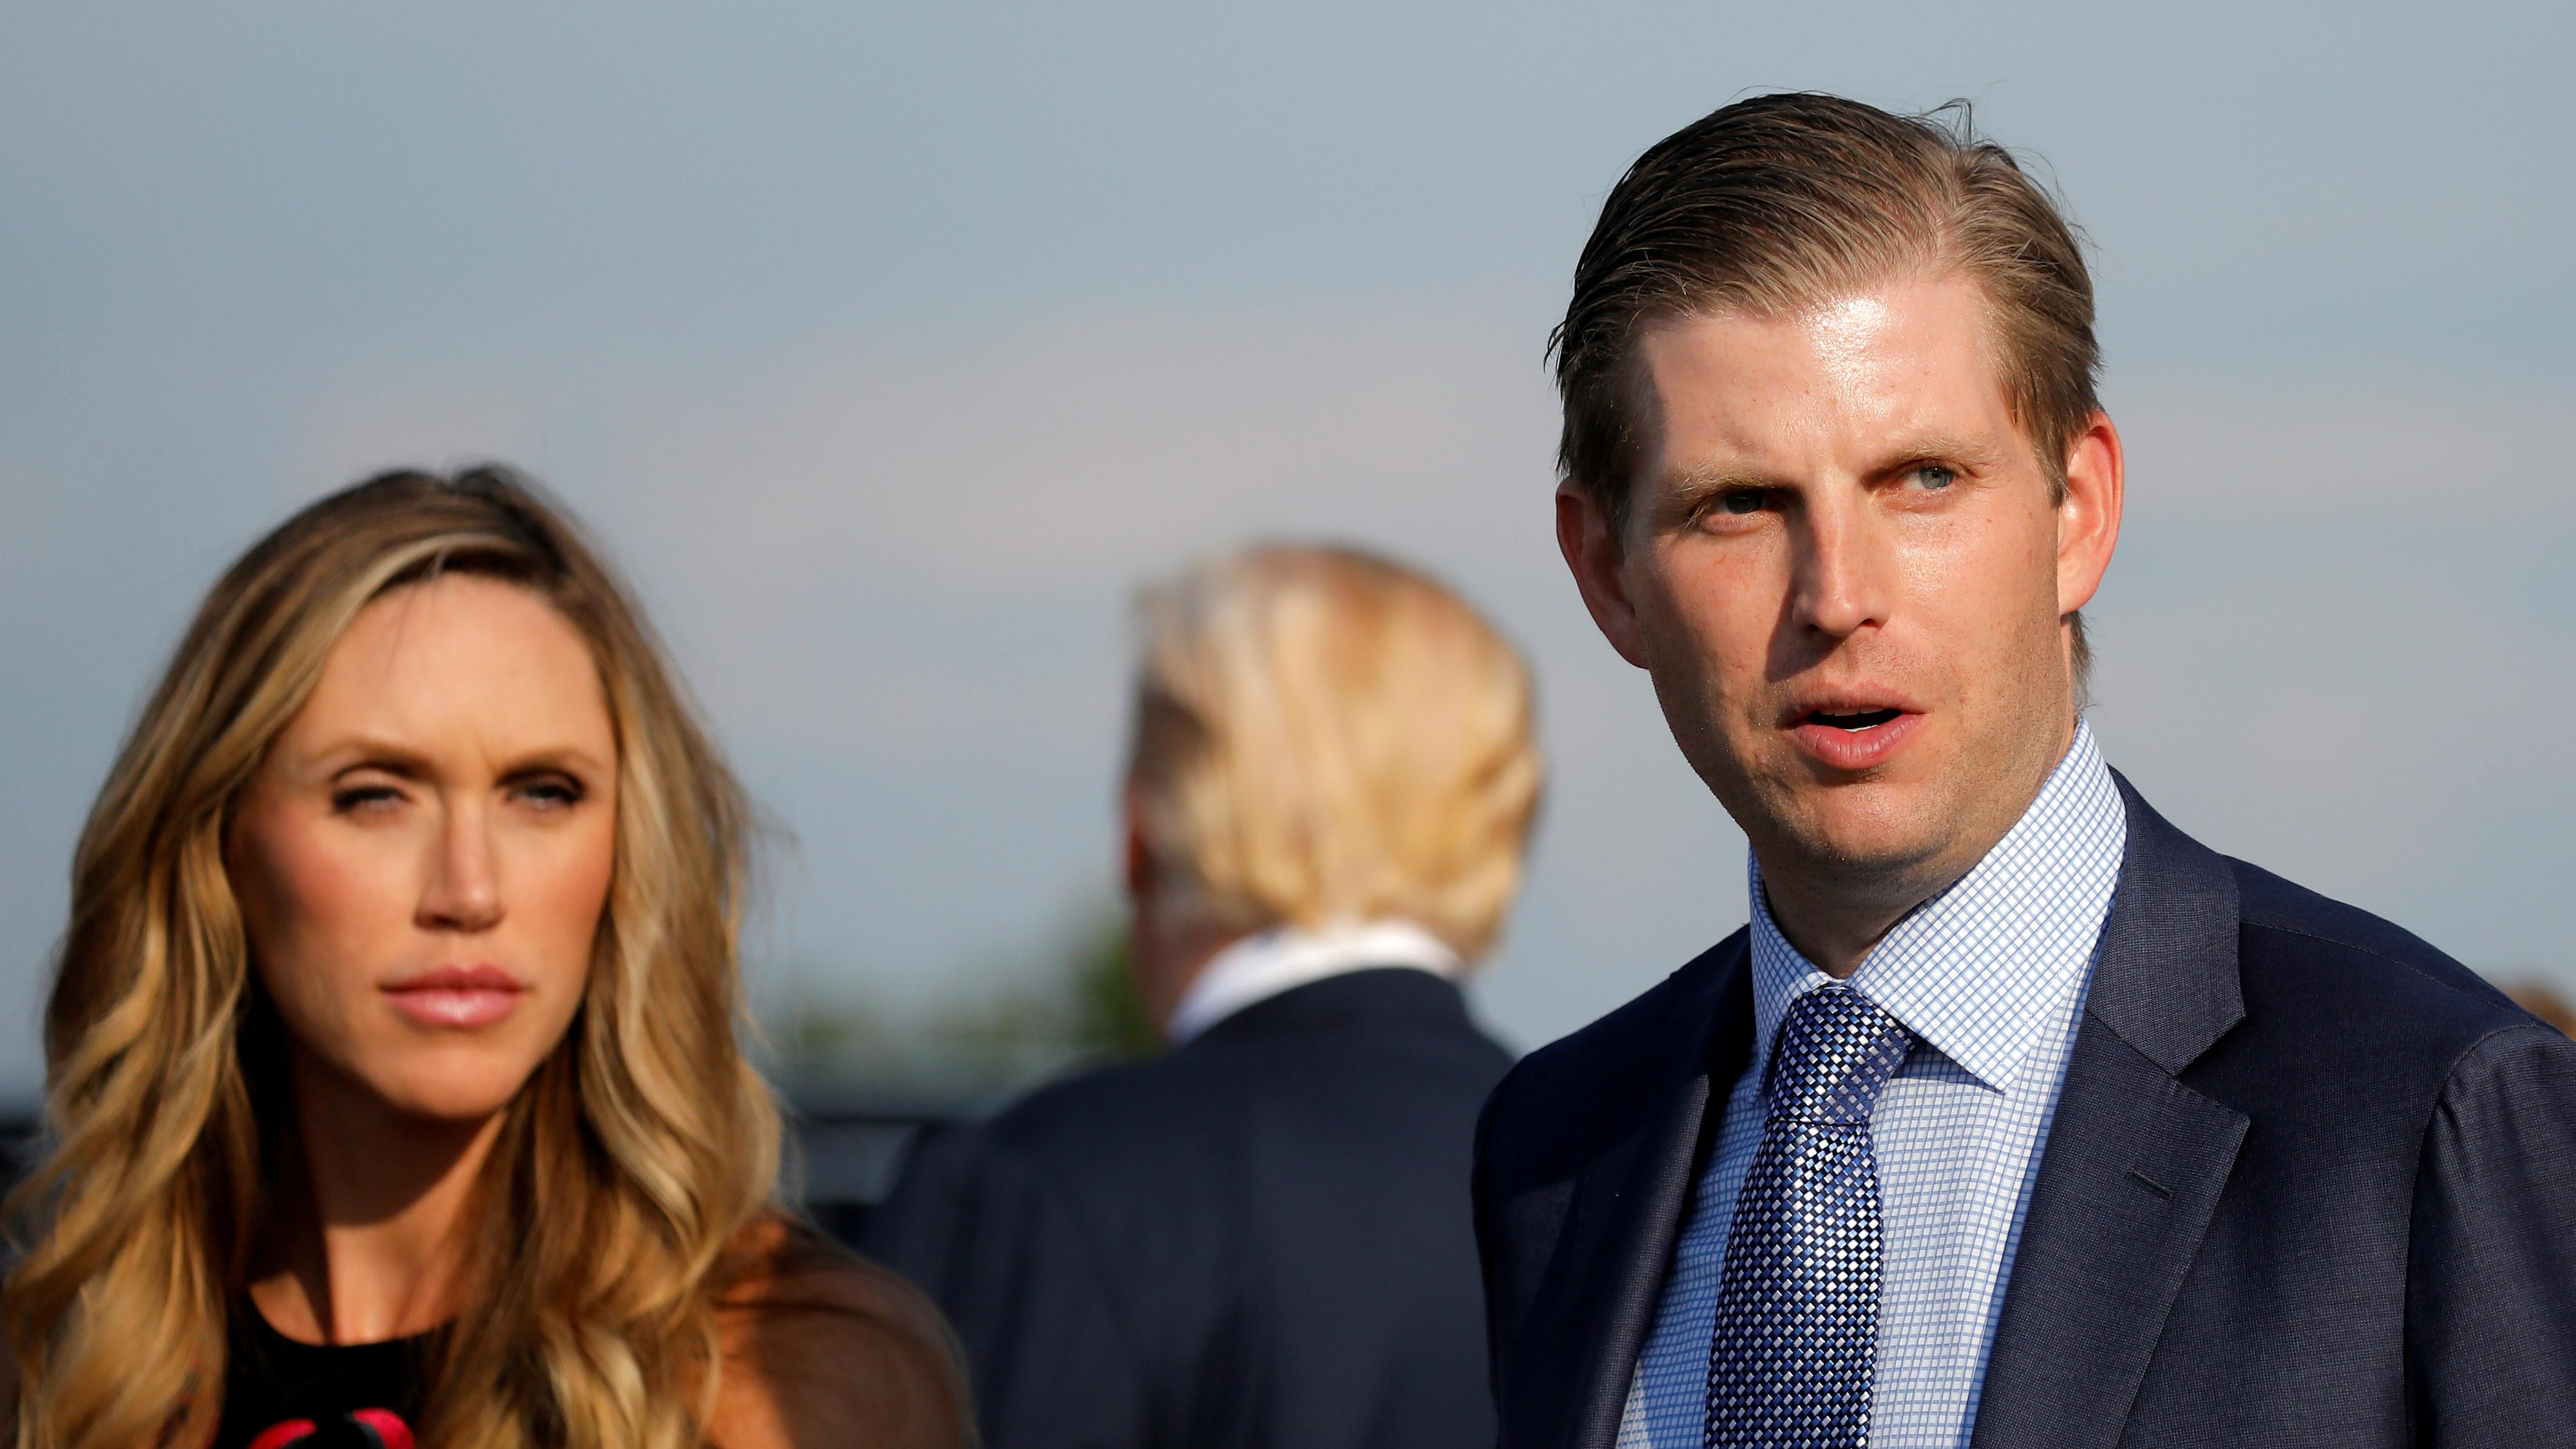 ric Trump and his wife Lara Yunaska arrive at Huntington tri-state airport.